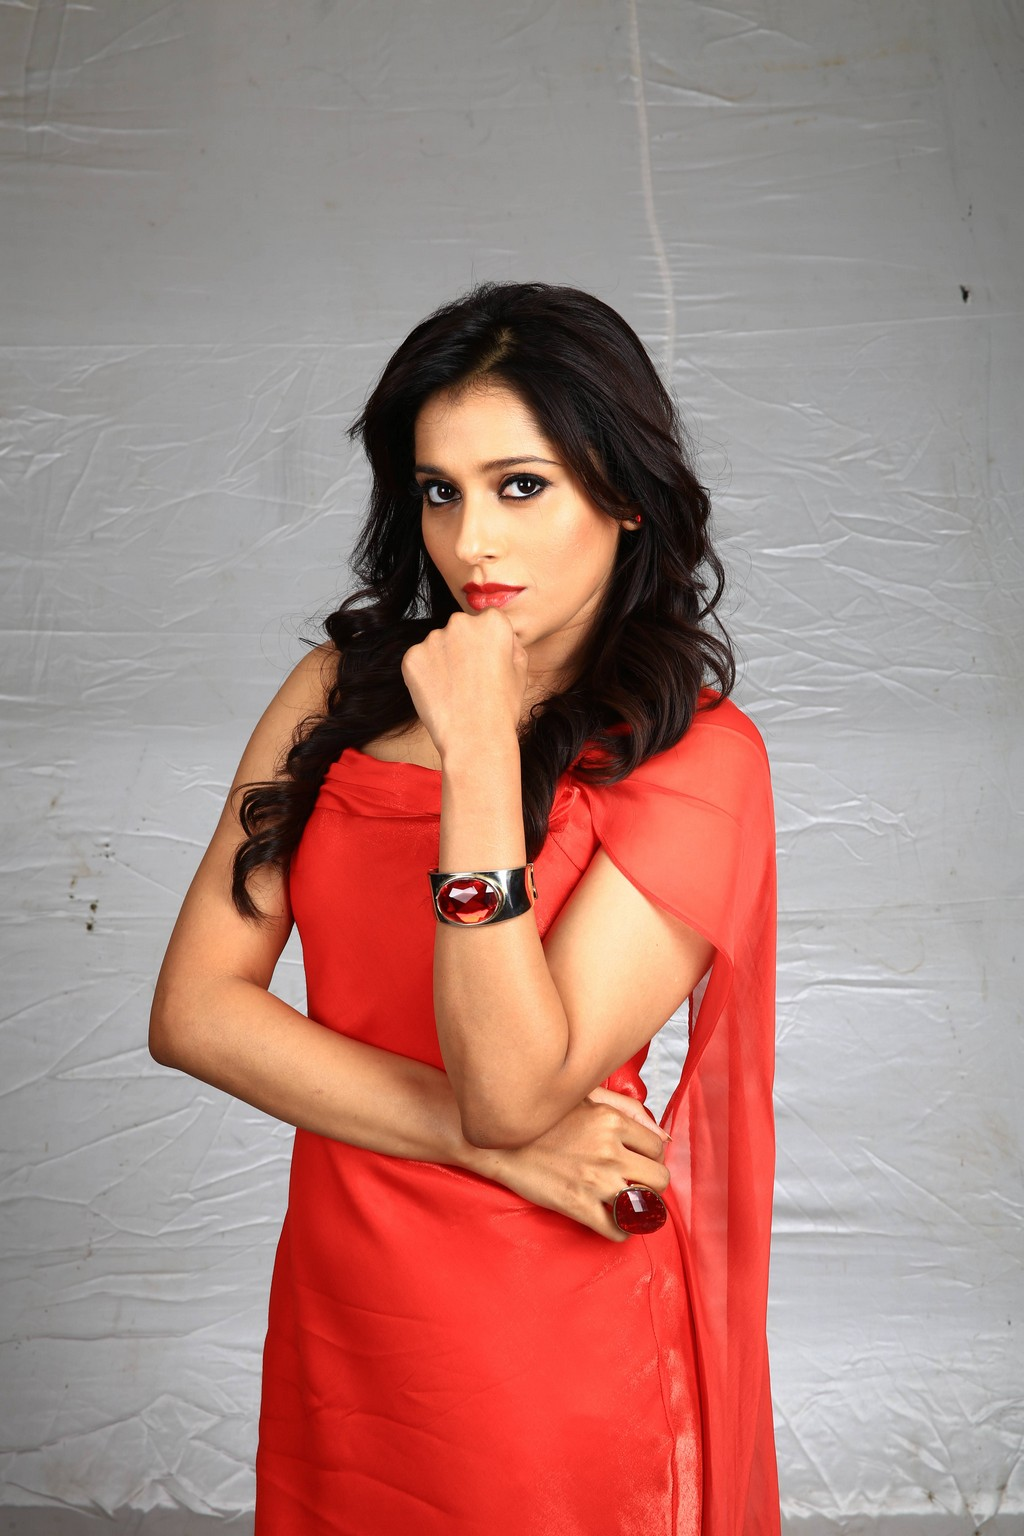 Telugu TV Anchor Rashmi Gautam Long Hair Hot Looking Face Photos In Orange Dress